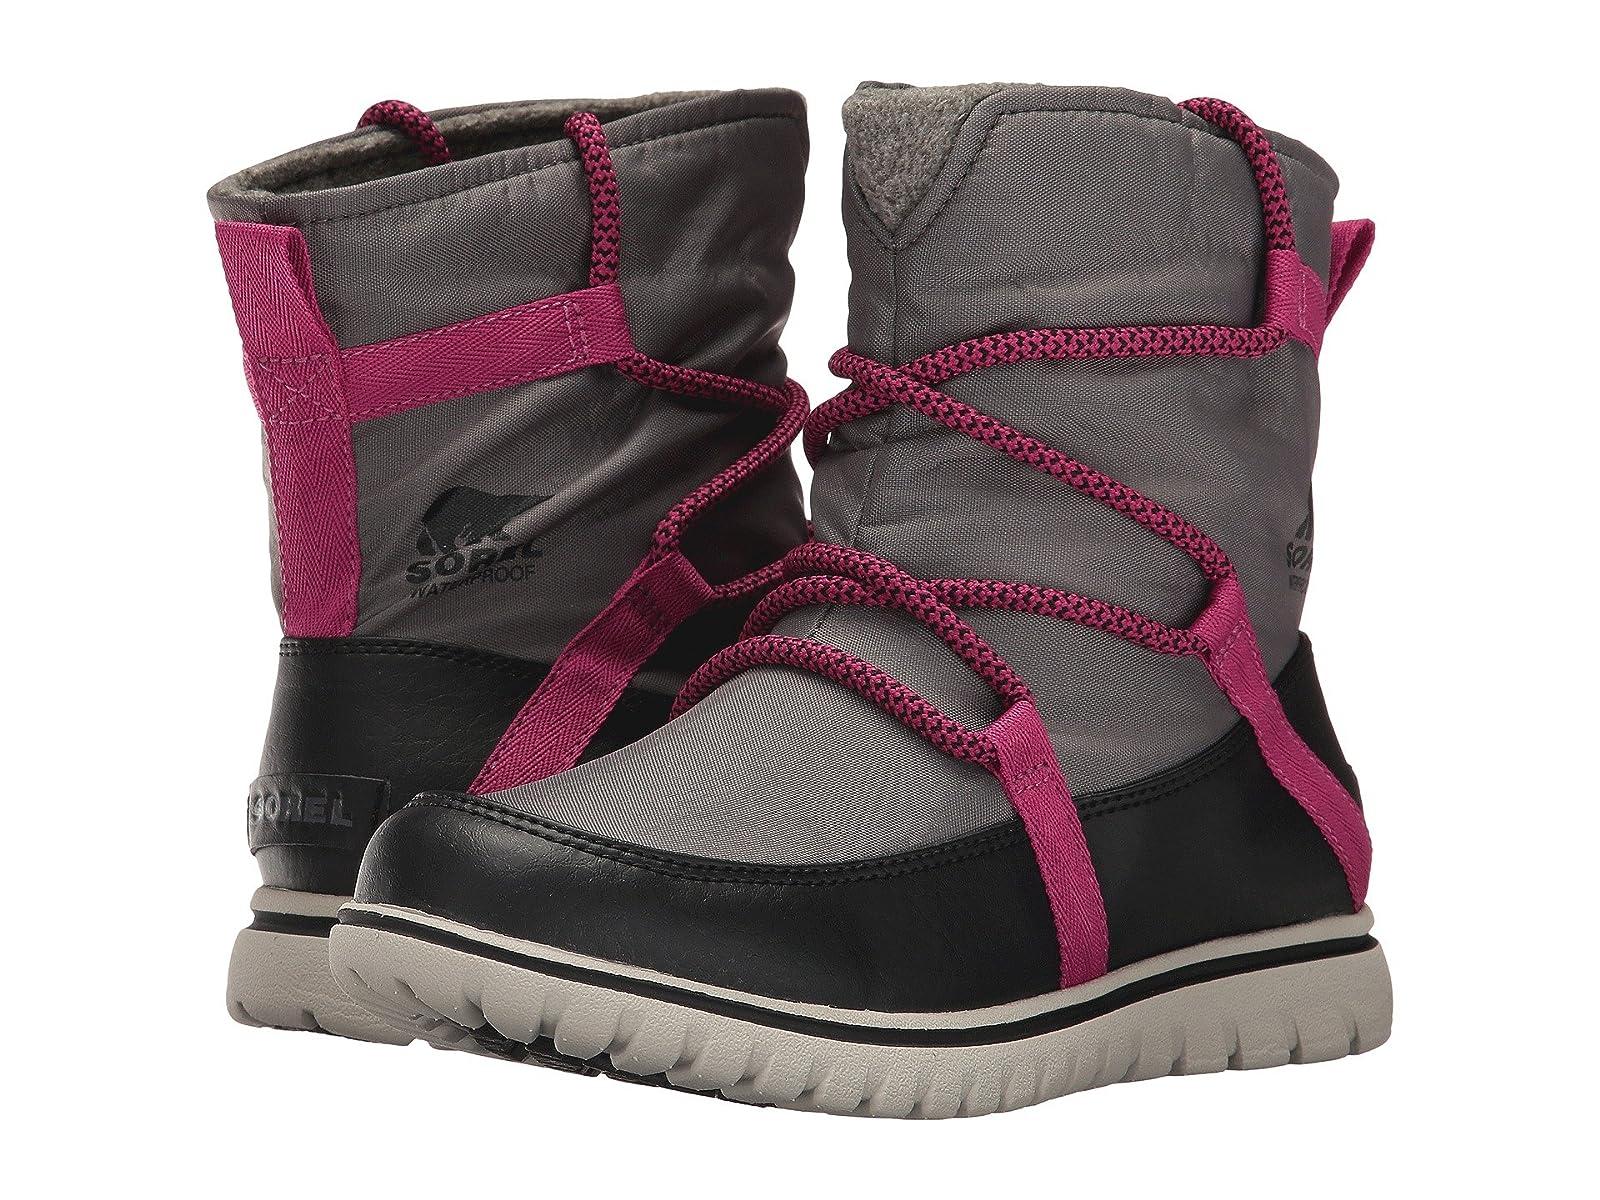 SOREL Cozy ExplorerCheap and distinctive eye-catching shoes